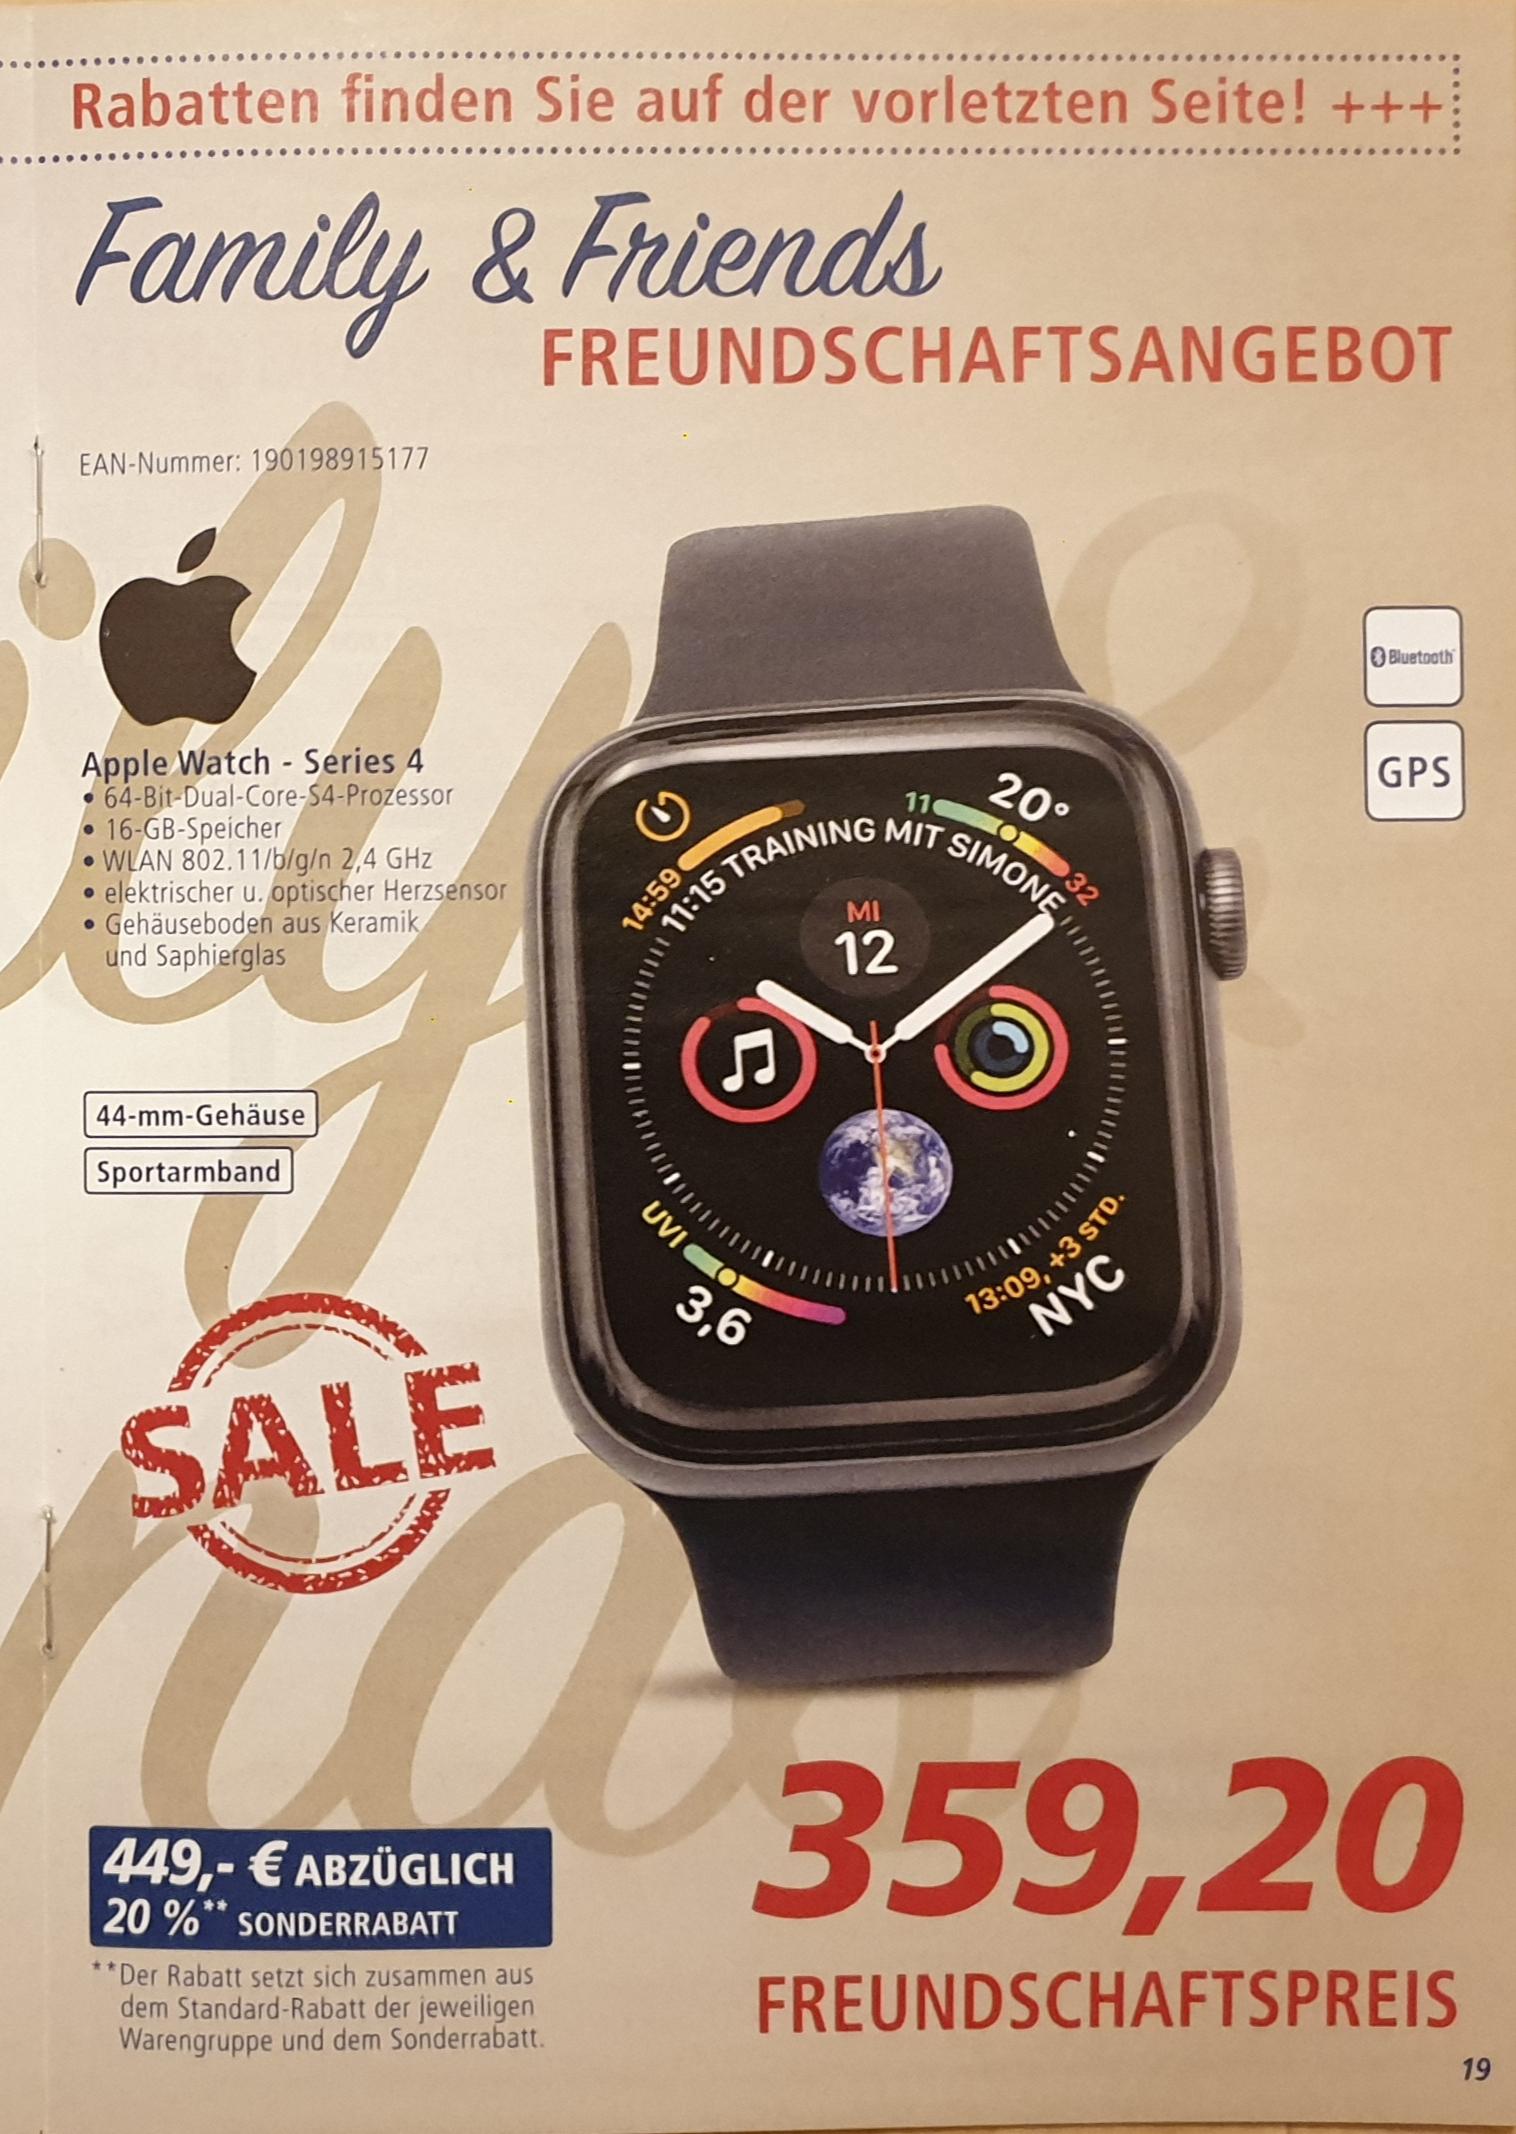 Apple Watch - Series 4, 64-Bit Dual Core, 16 GB Speicher, 44mm Gehäuse, Bluetooth, GPS, WLAN [ am 02./03.08.19 bei REAL Family & Friends]